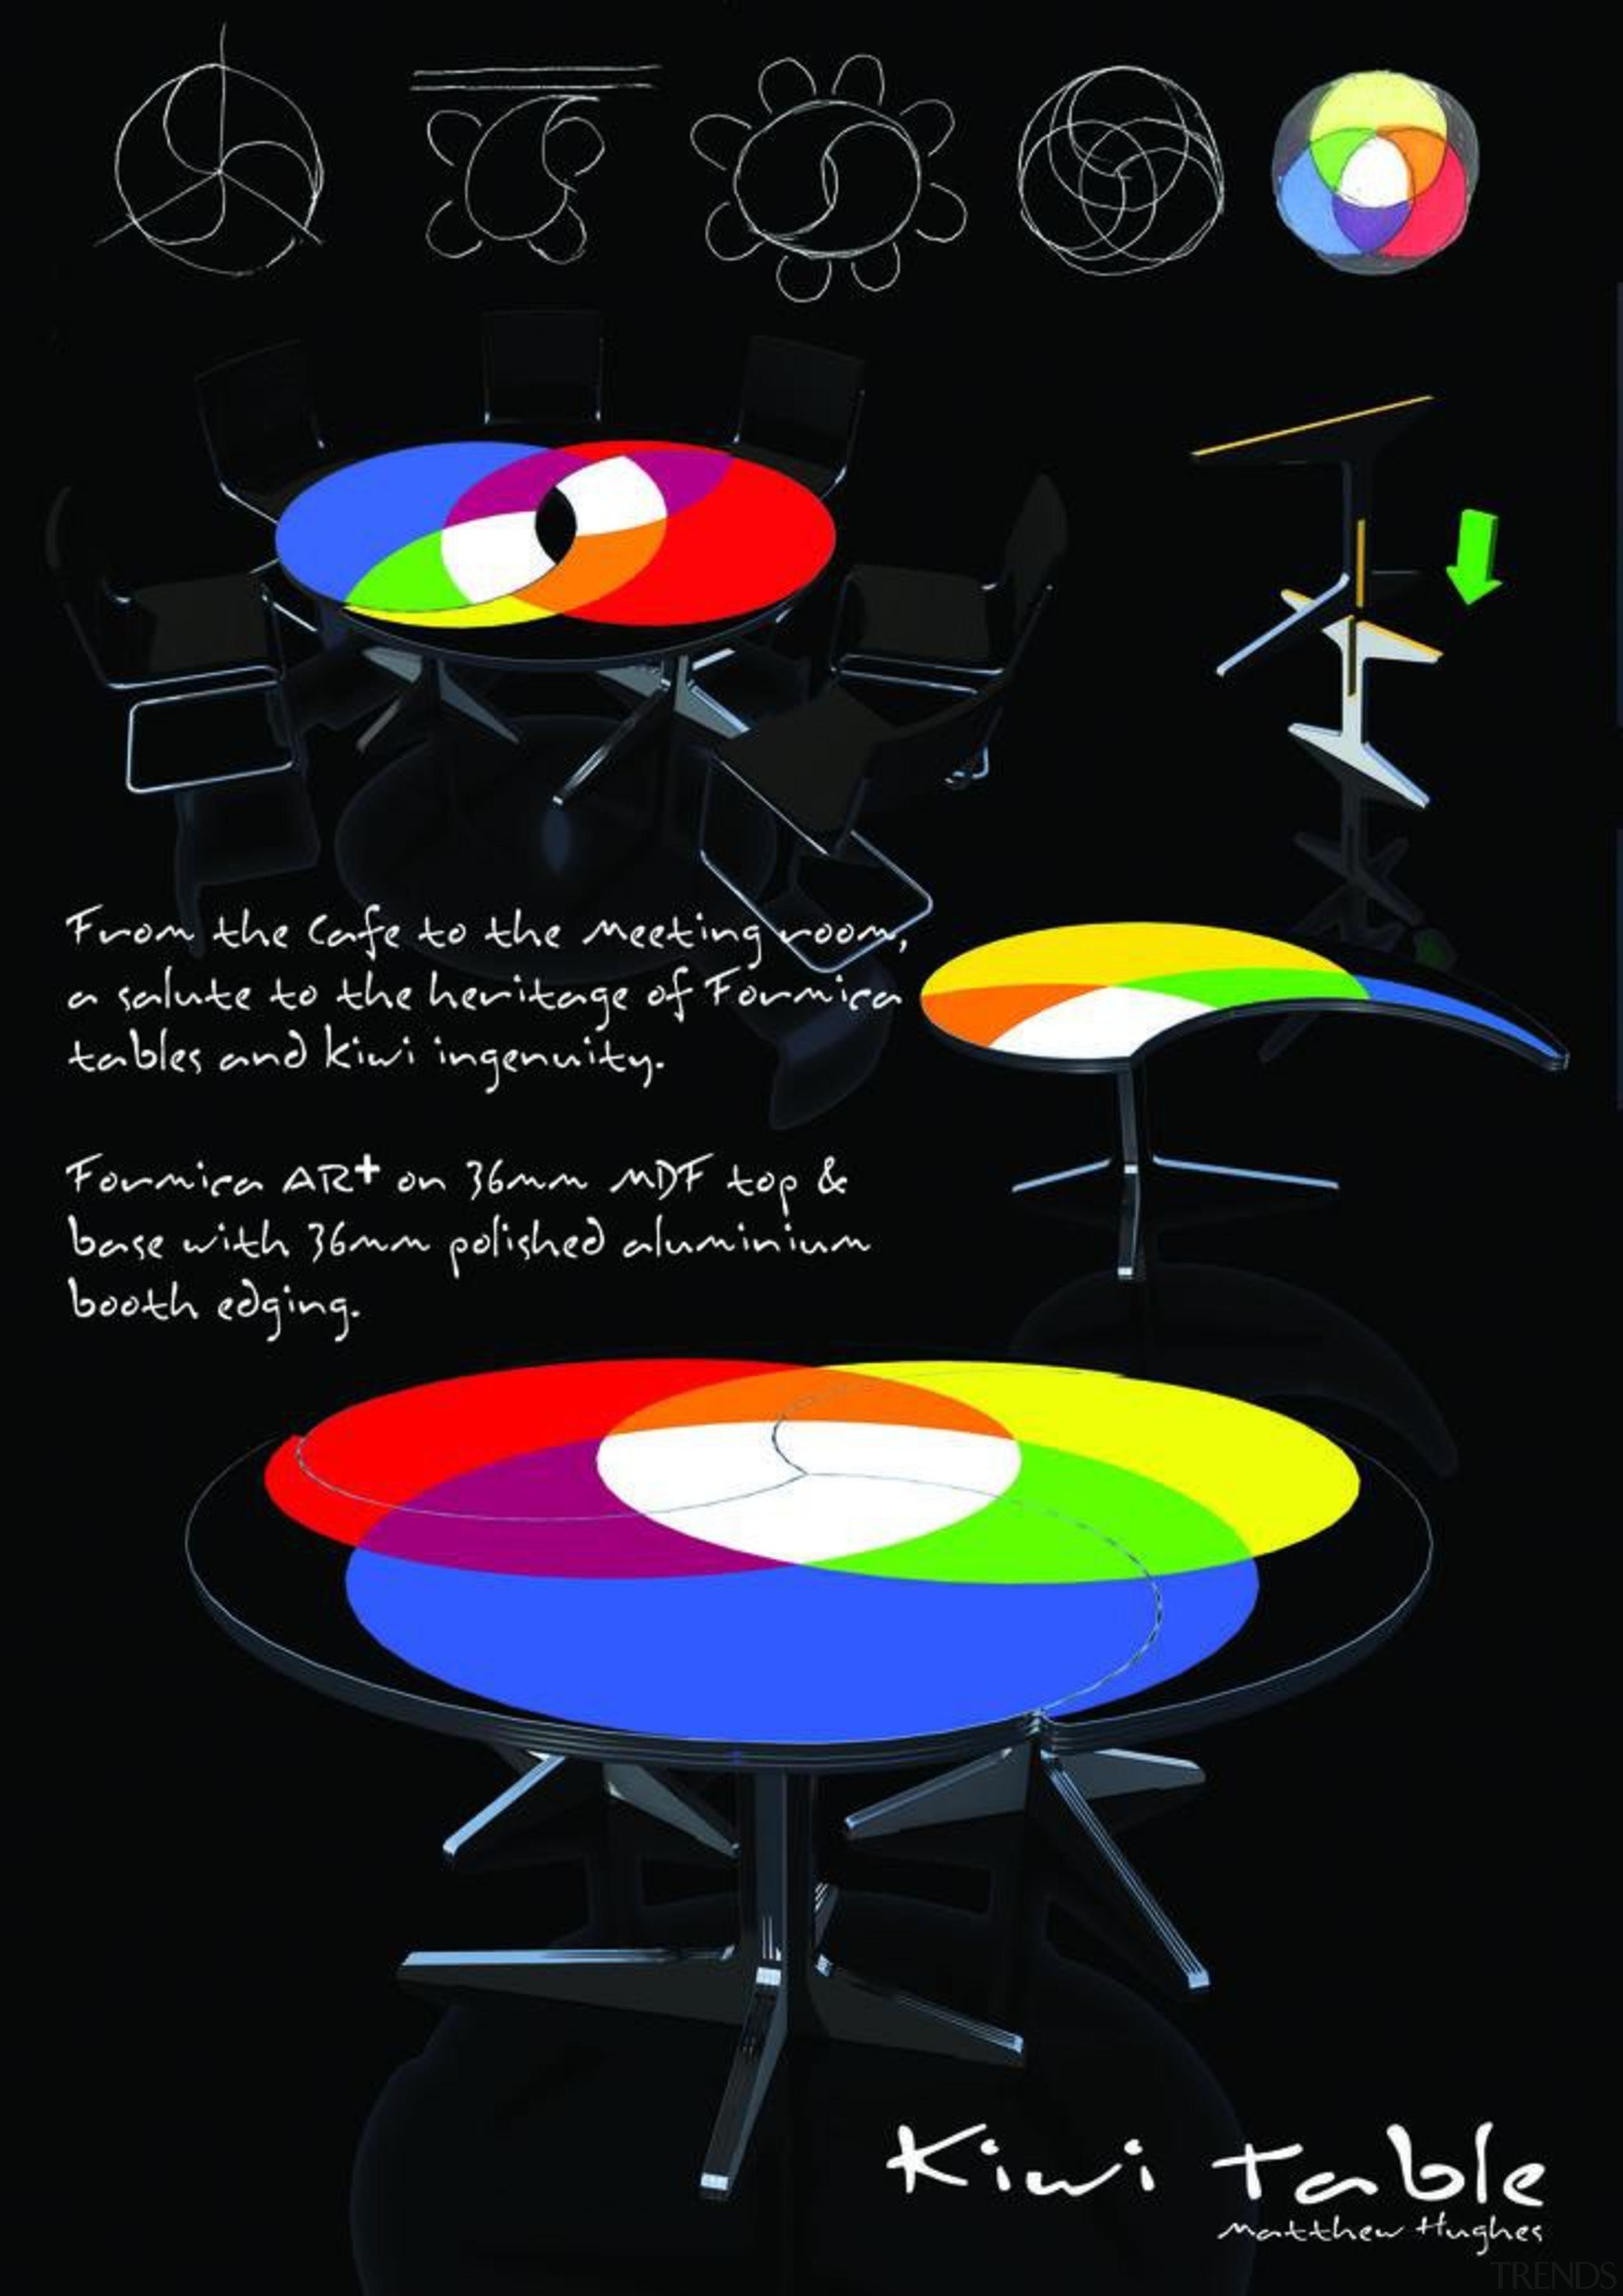 Matthew Hughes - Kiwi Table - font | font, graphic design, light, lighting, poster, product design, black